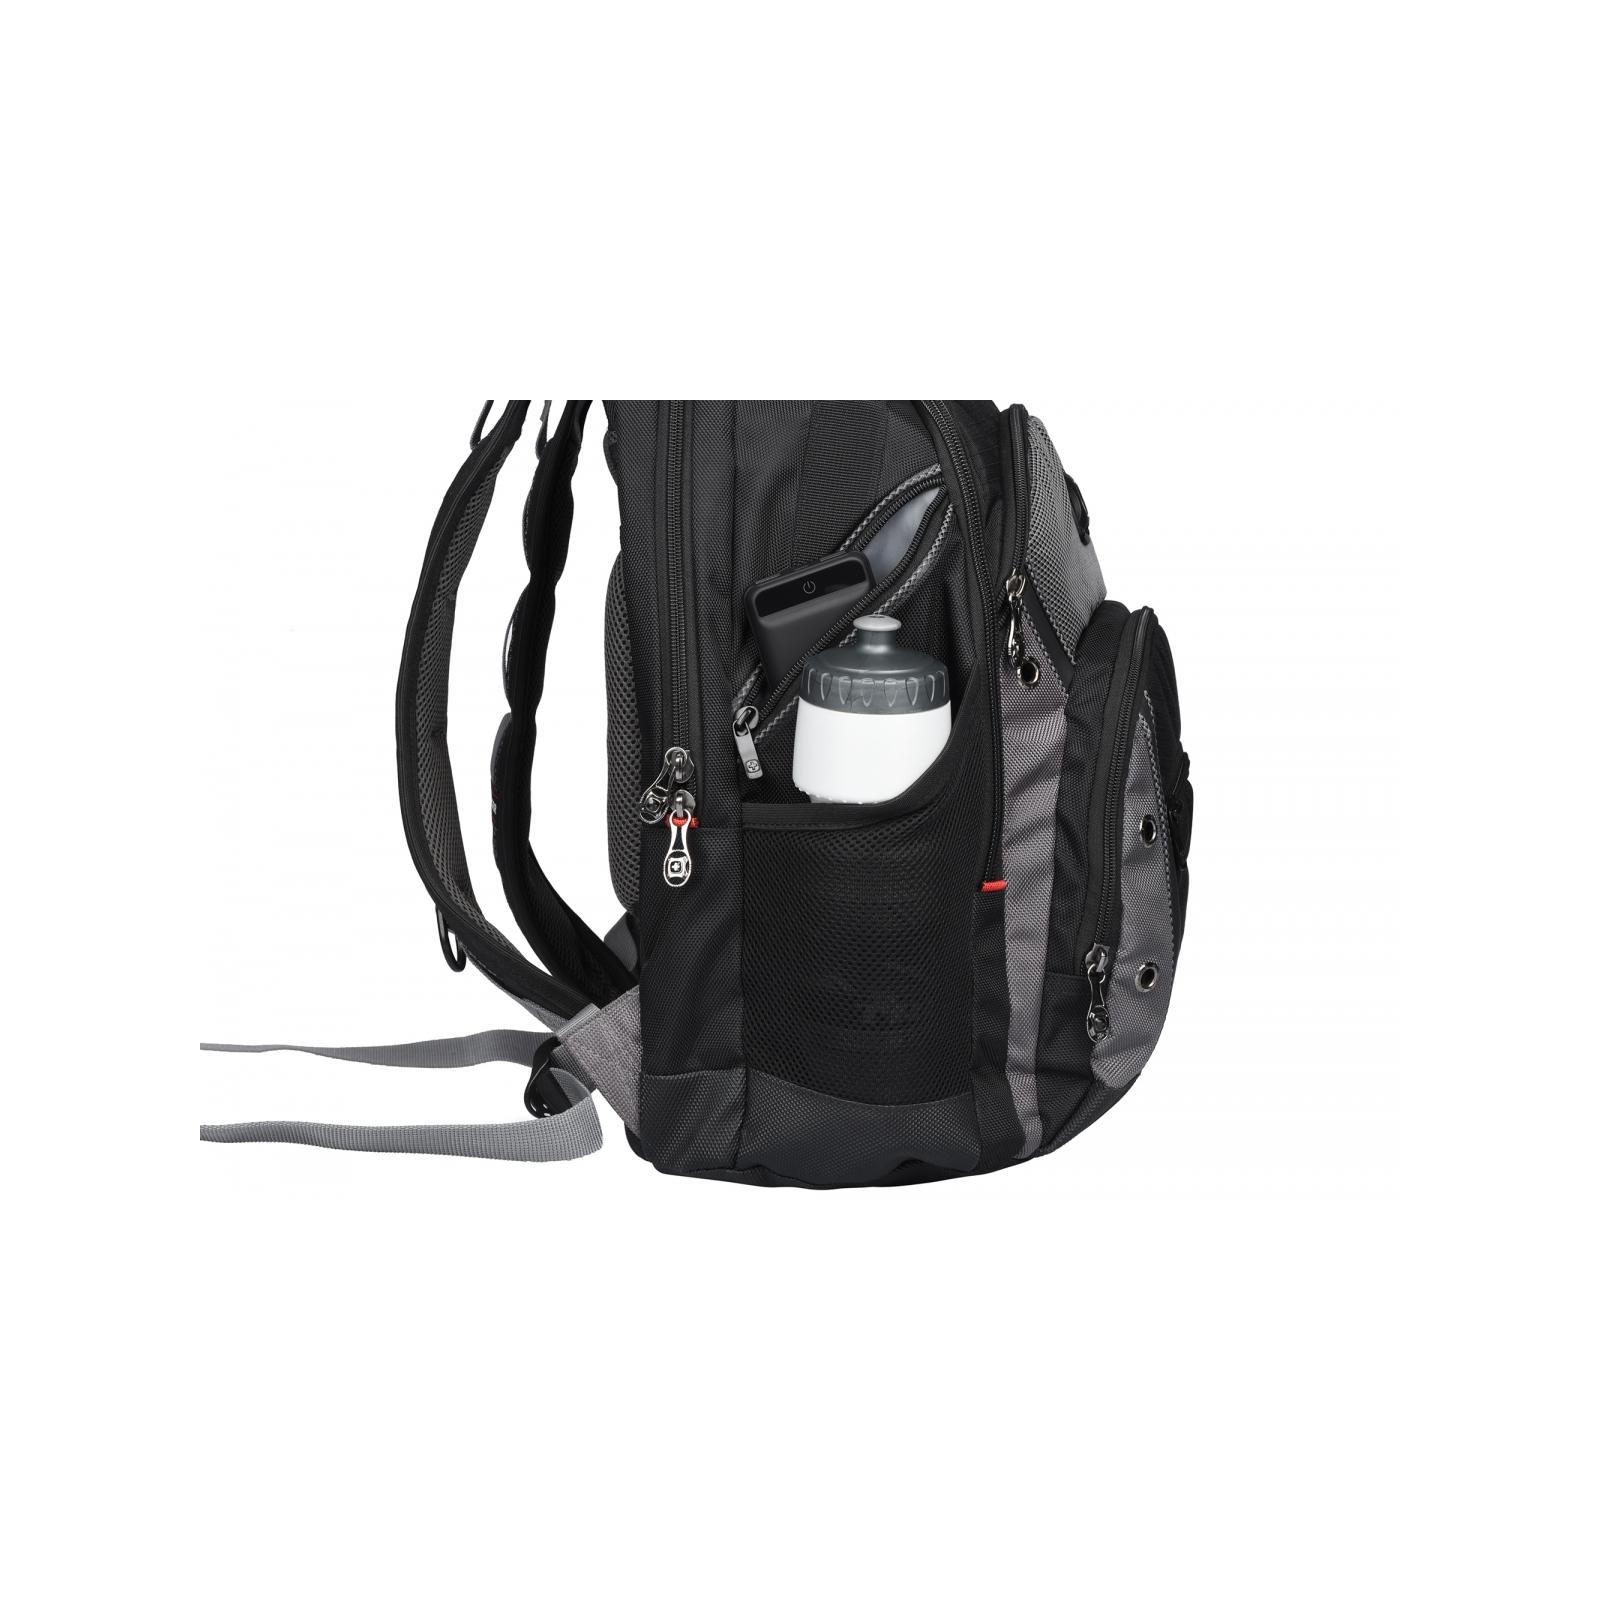 "Рюкзак для ноутбука Wenger 16"" Synergy Black/Gray (600635) изображение 11"